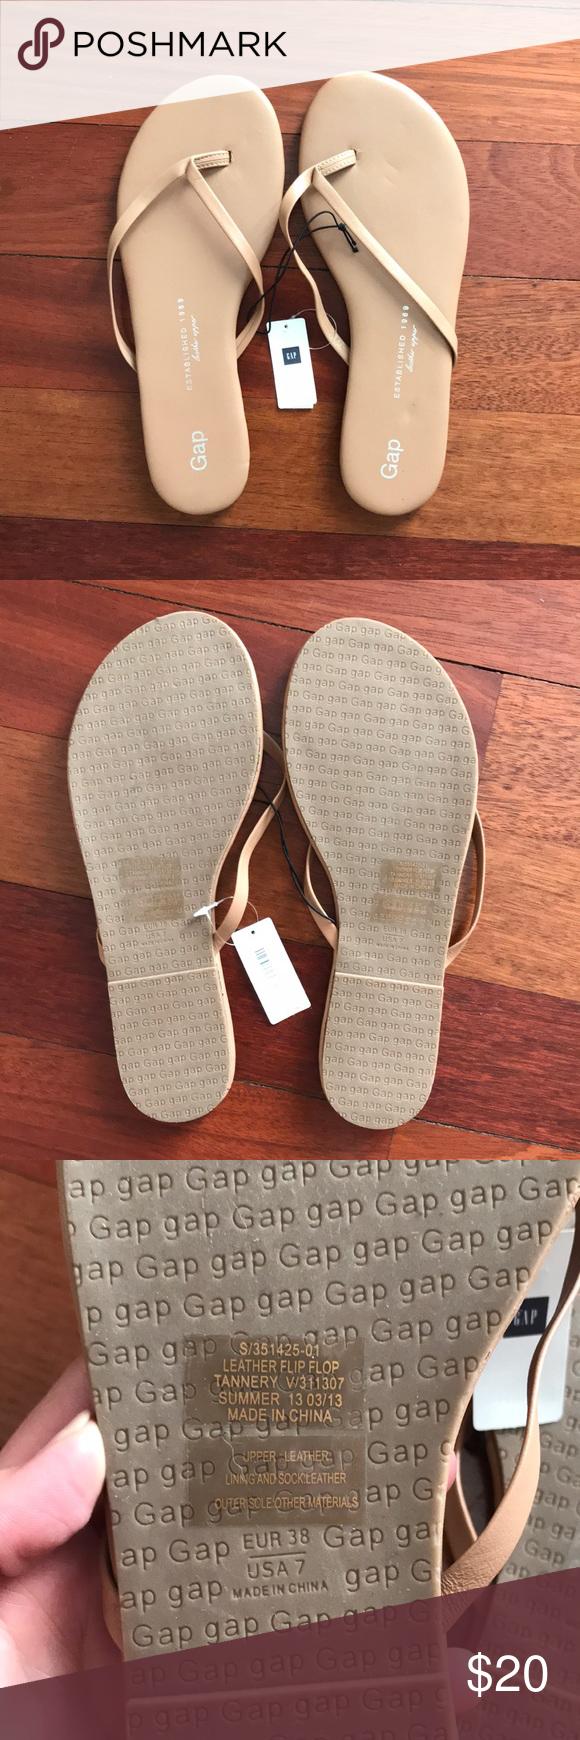 fd3d0b49e61b I just added this listing on Poshmark  ✨NWT! GAP Nude Leather Flip-Flop  Sandals - 7.  shopmycloset  poshmark  fashion  shopping  style  forsale  GAP   Shoes